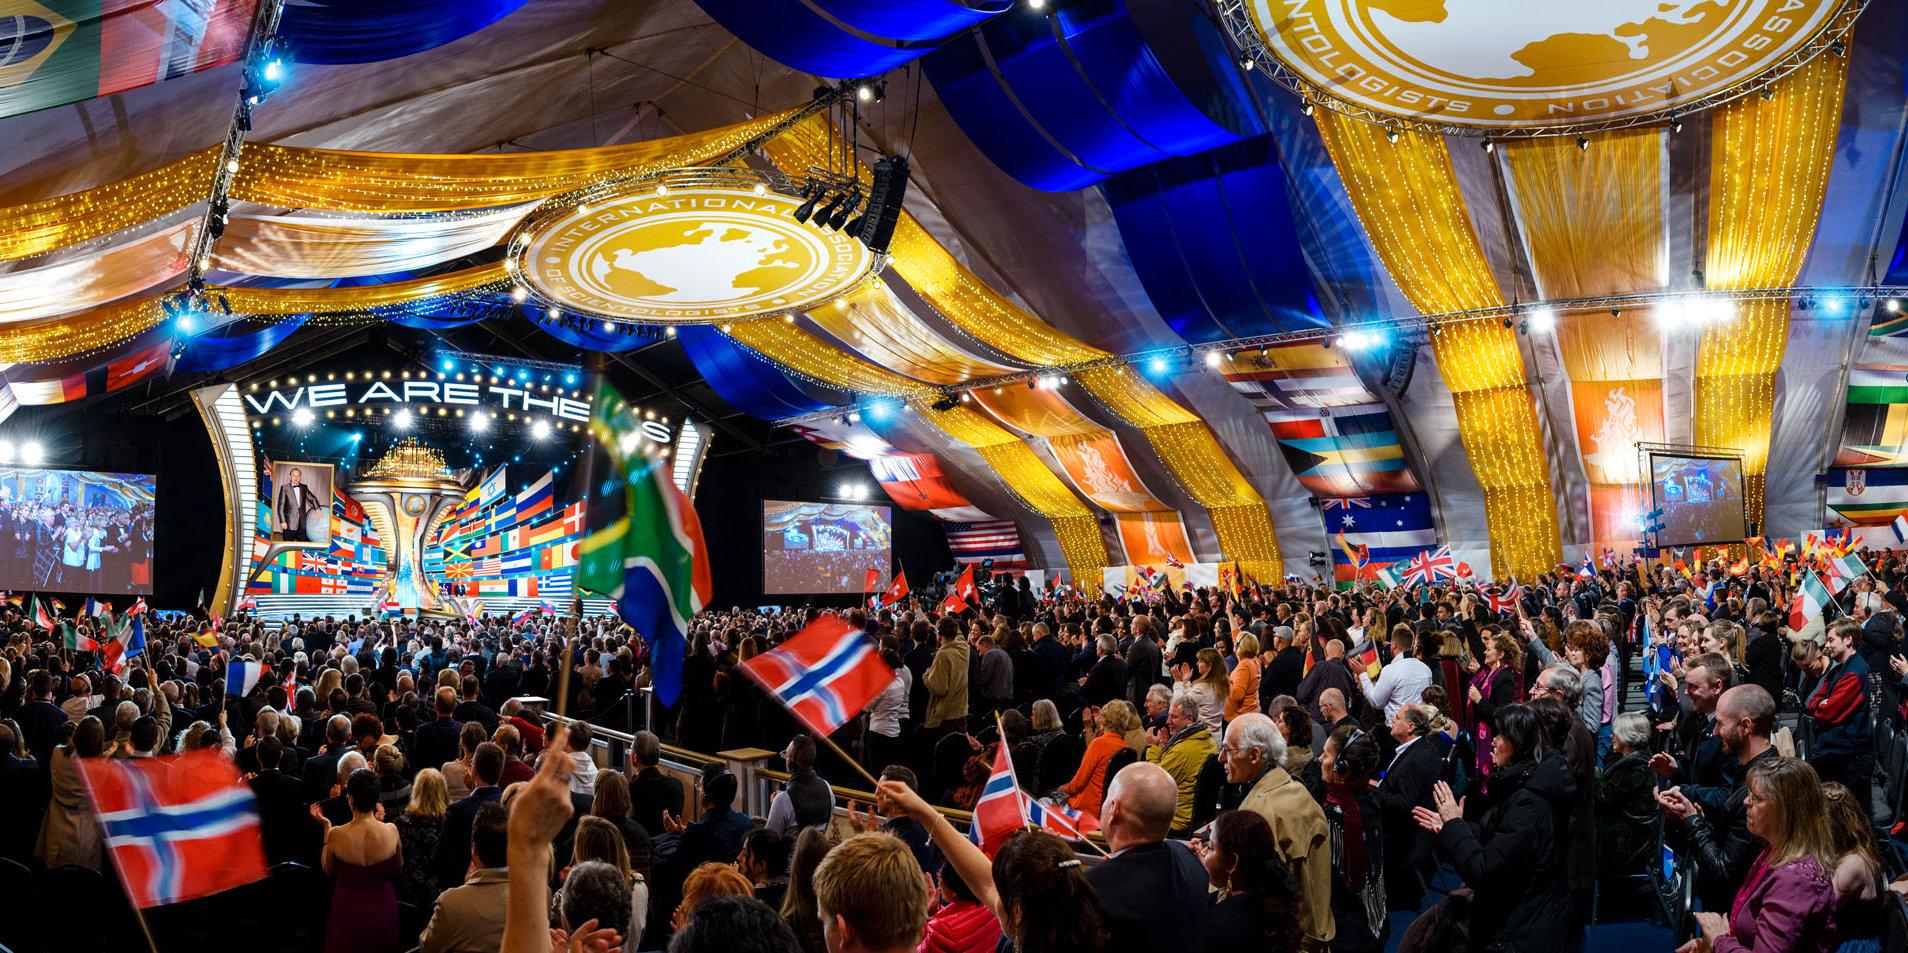 International Association of Scientologists anniversary